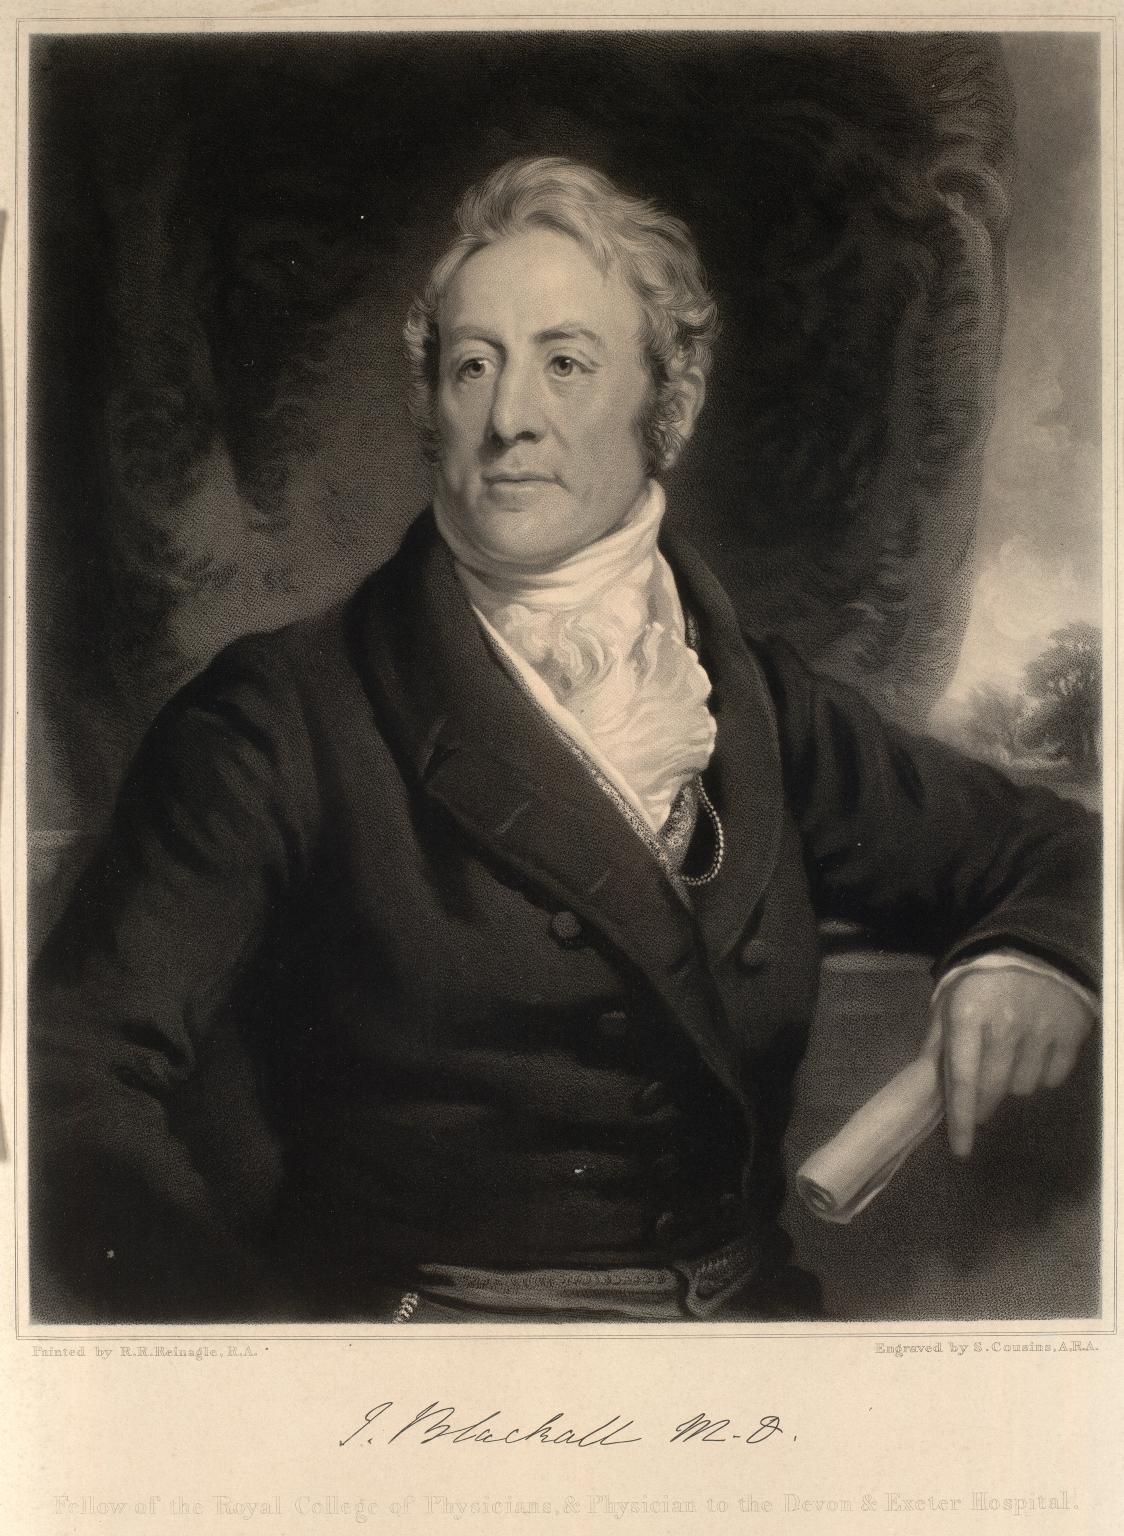 John Blackall (1771-1860), Physician to the Devon and Exeter Hospital